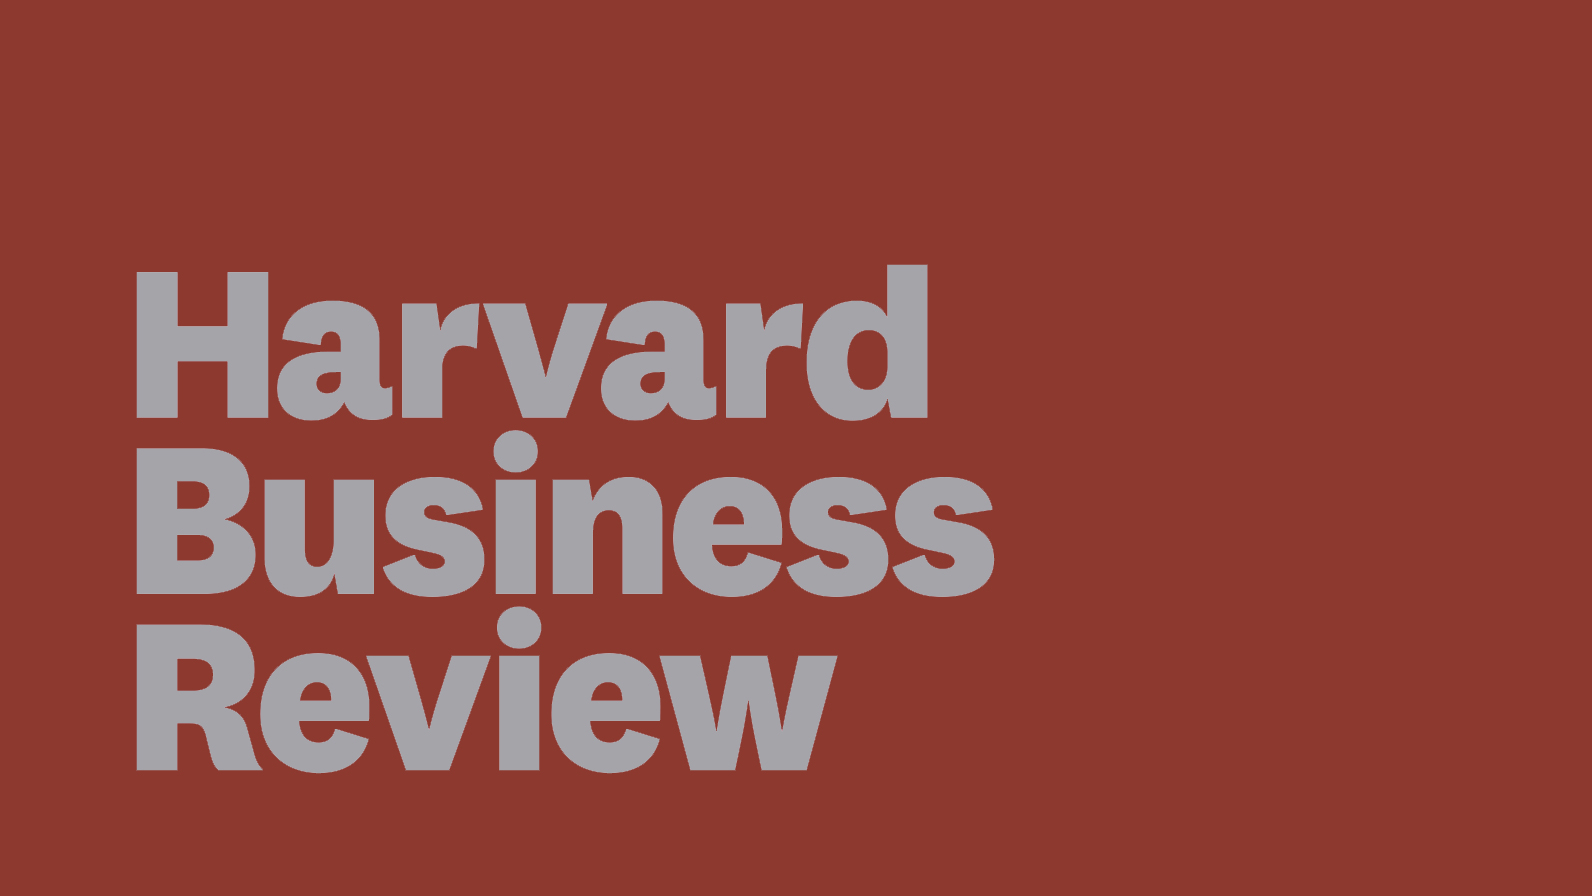 harvard business review - HD1592×896